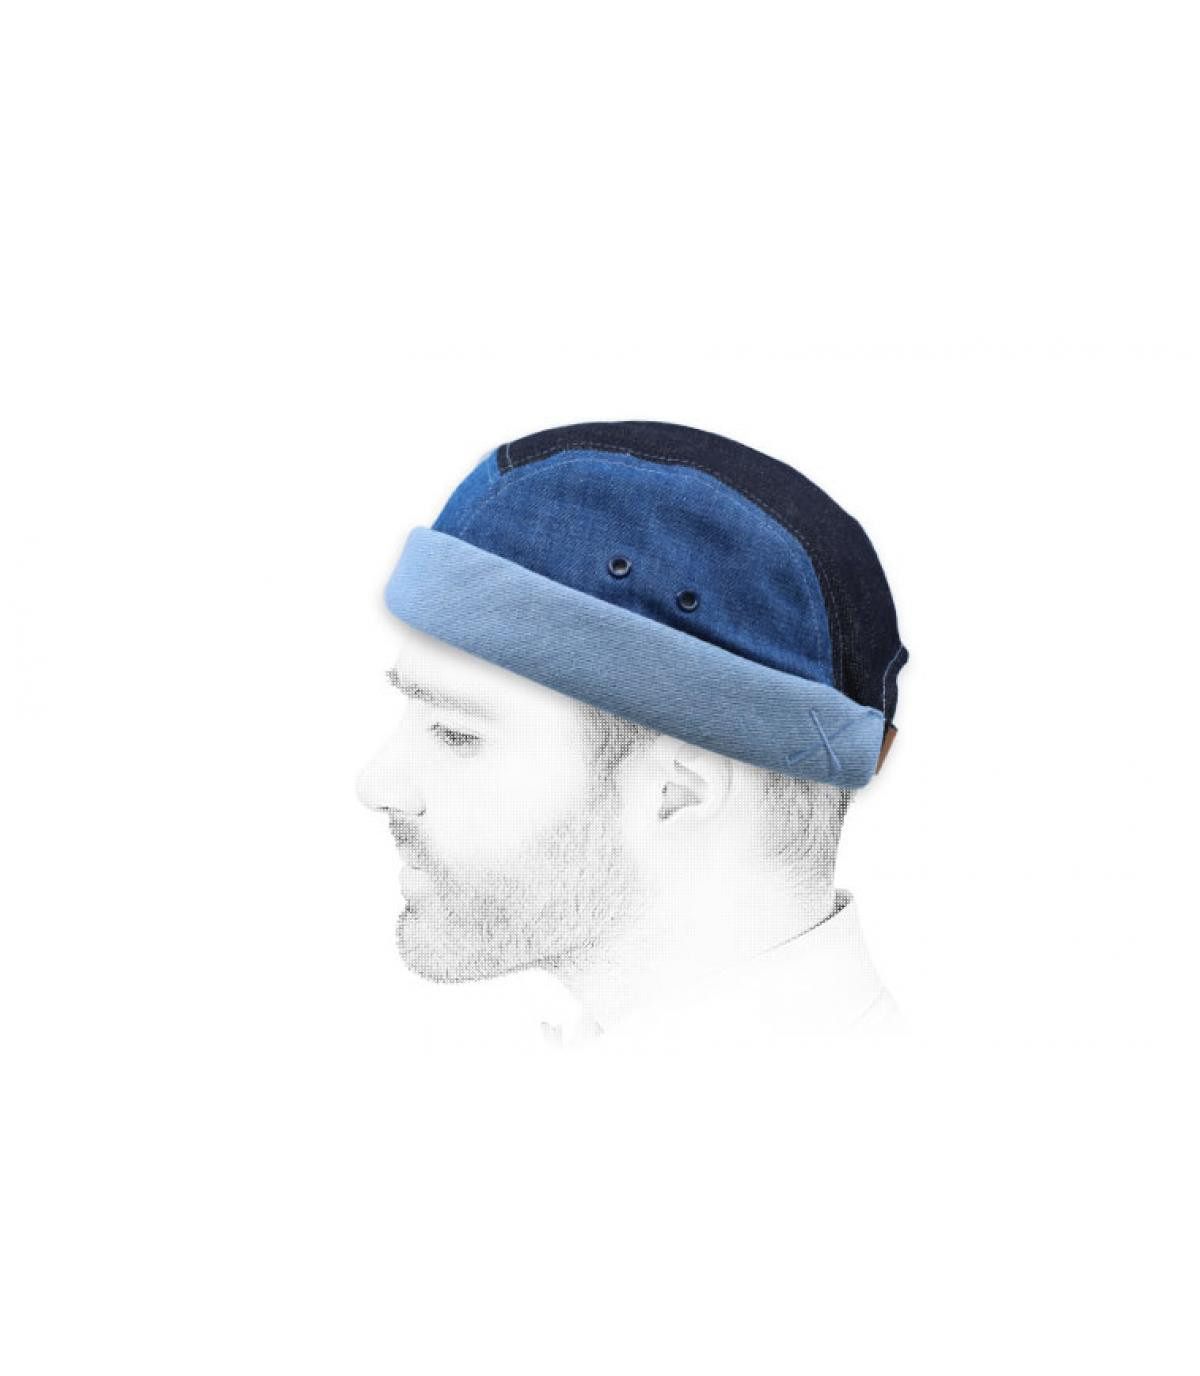 miki rayas azul